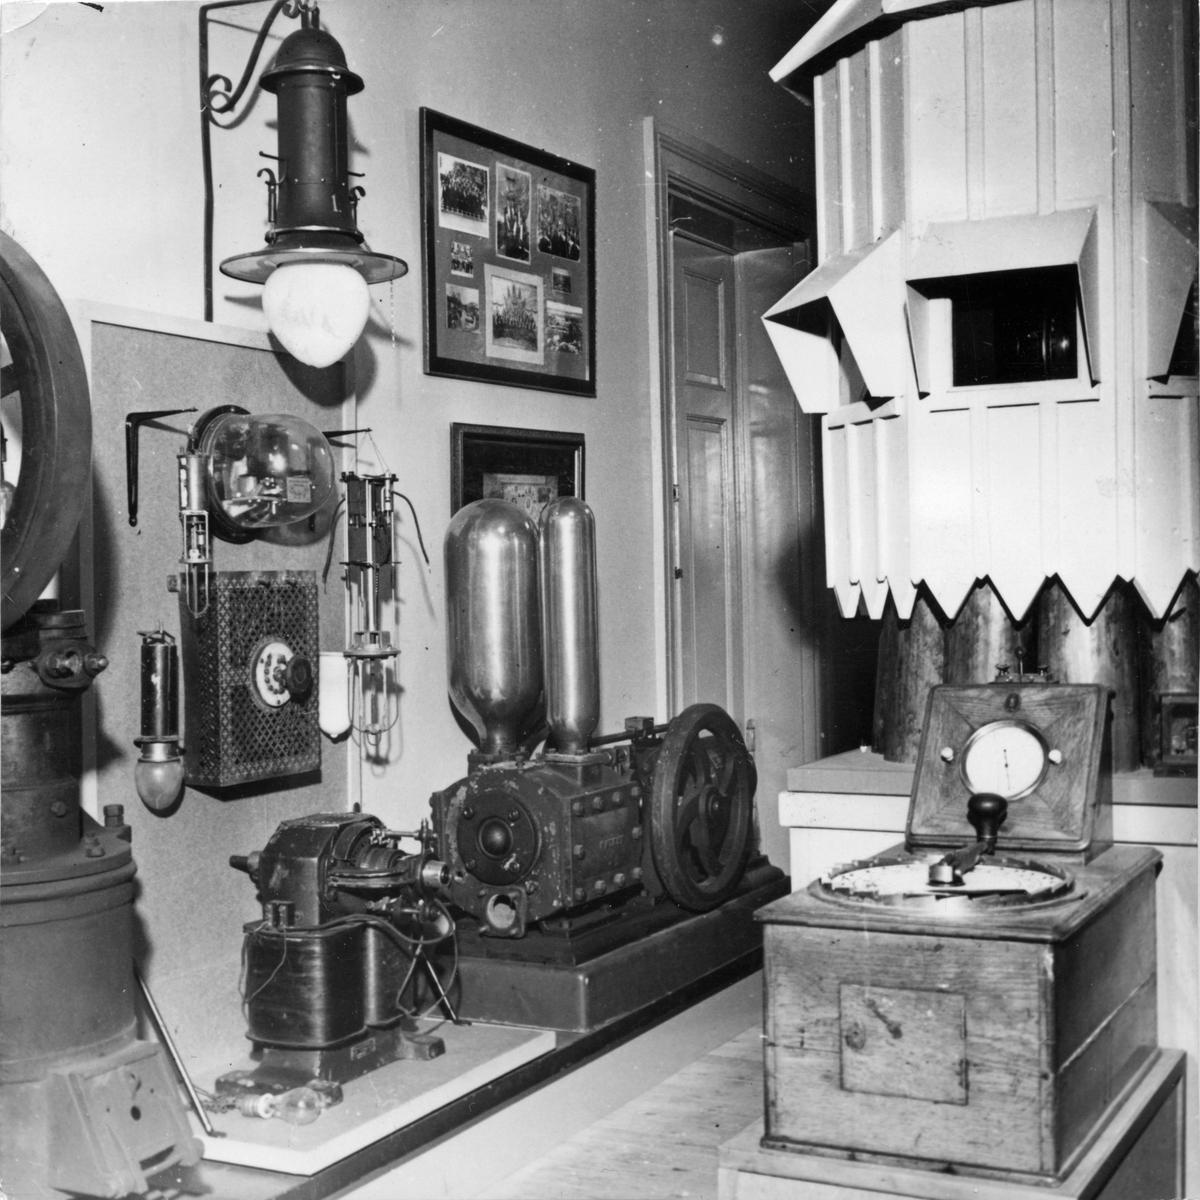 Gamla museets basutställning. (Karlberg?)